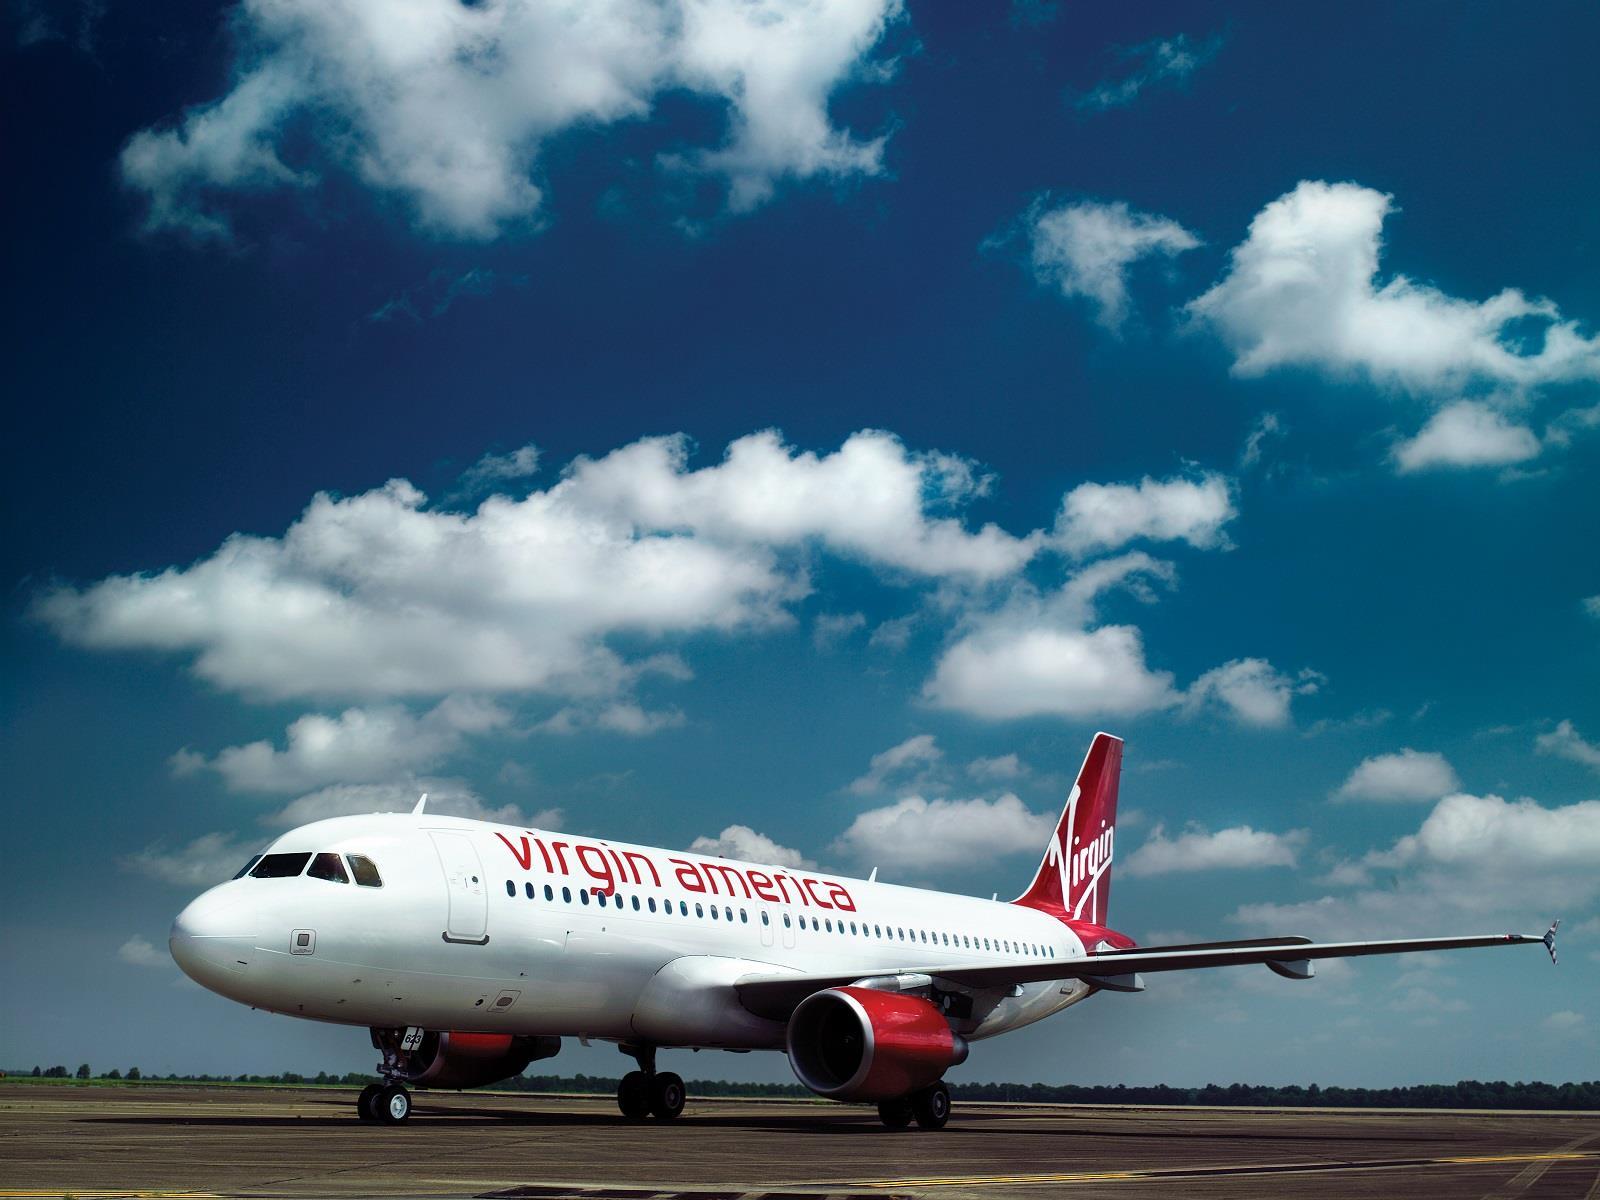 Image: Virgin America plane